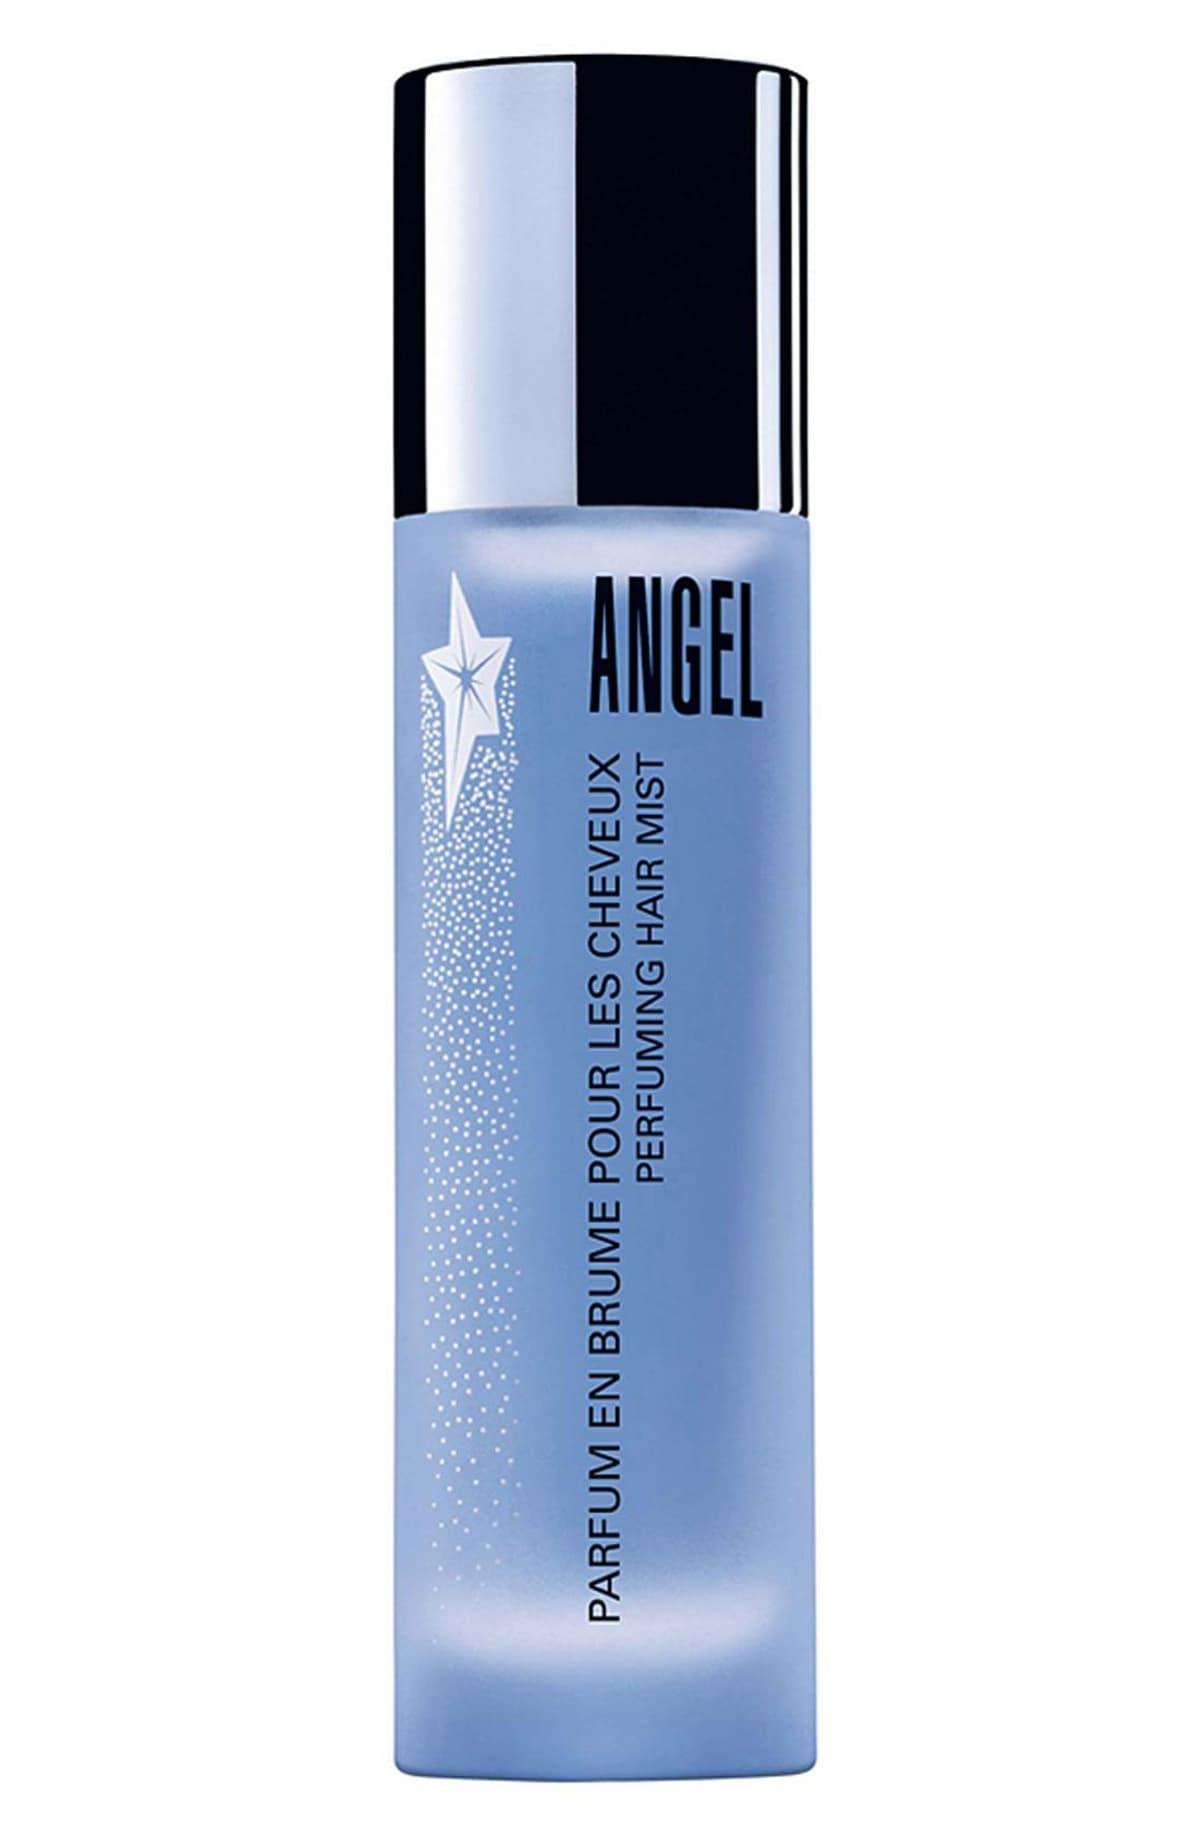 Perfume Angel Hair Mist 30ml - Mugler